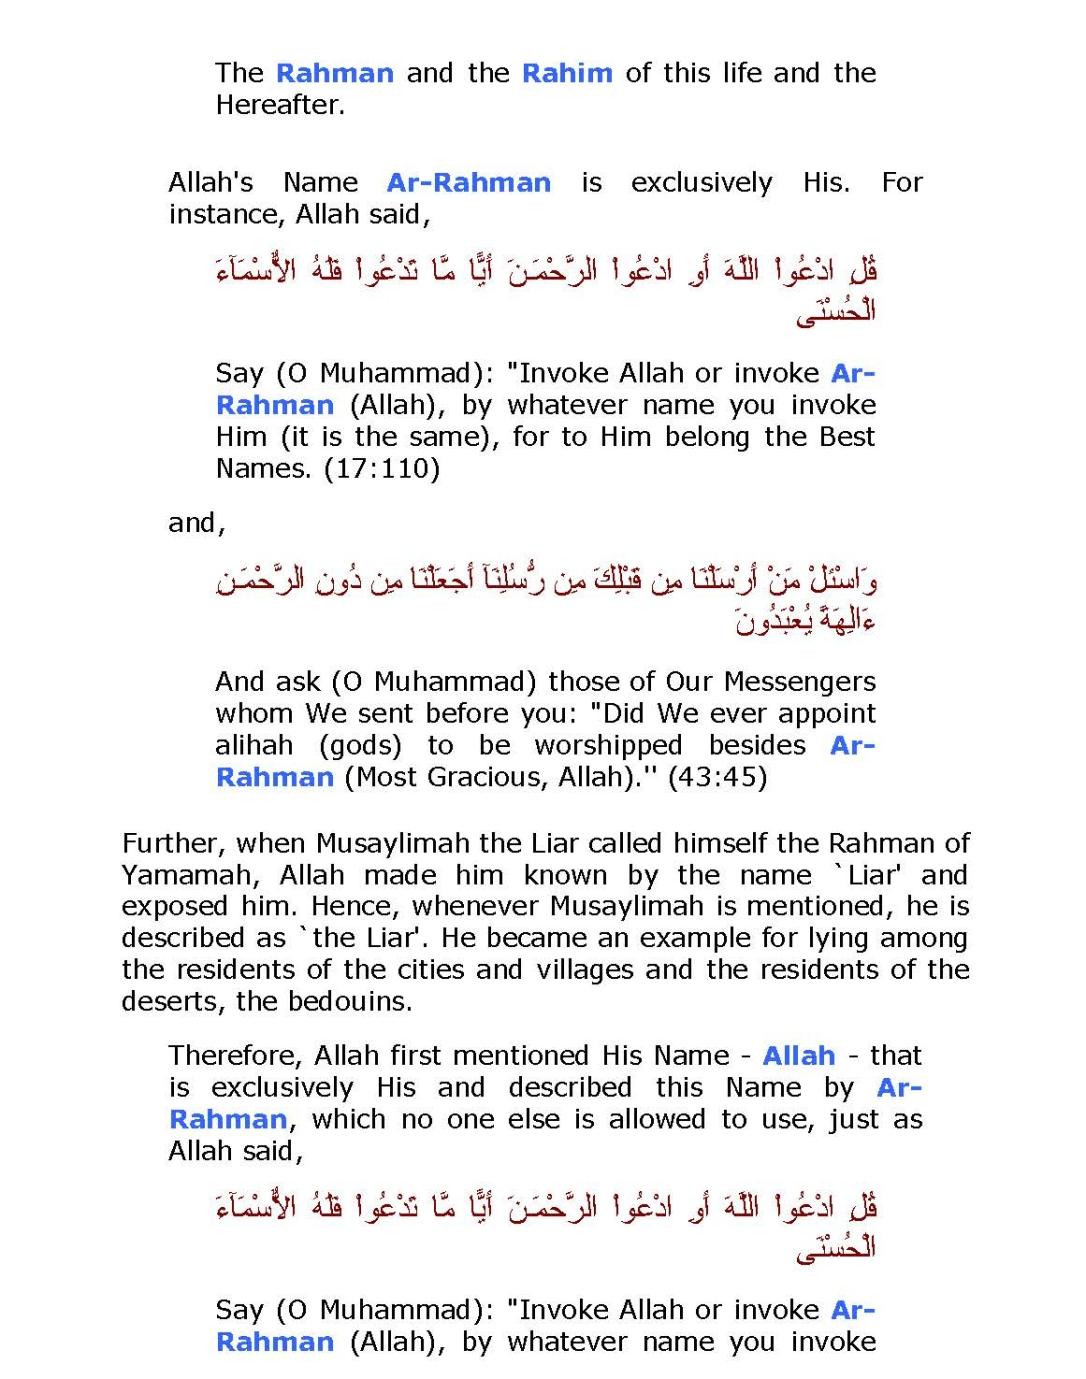 001fateh_page_37.jpg